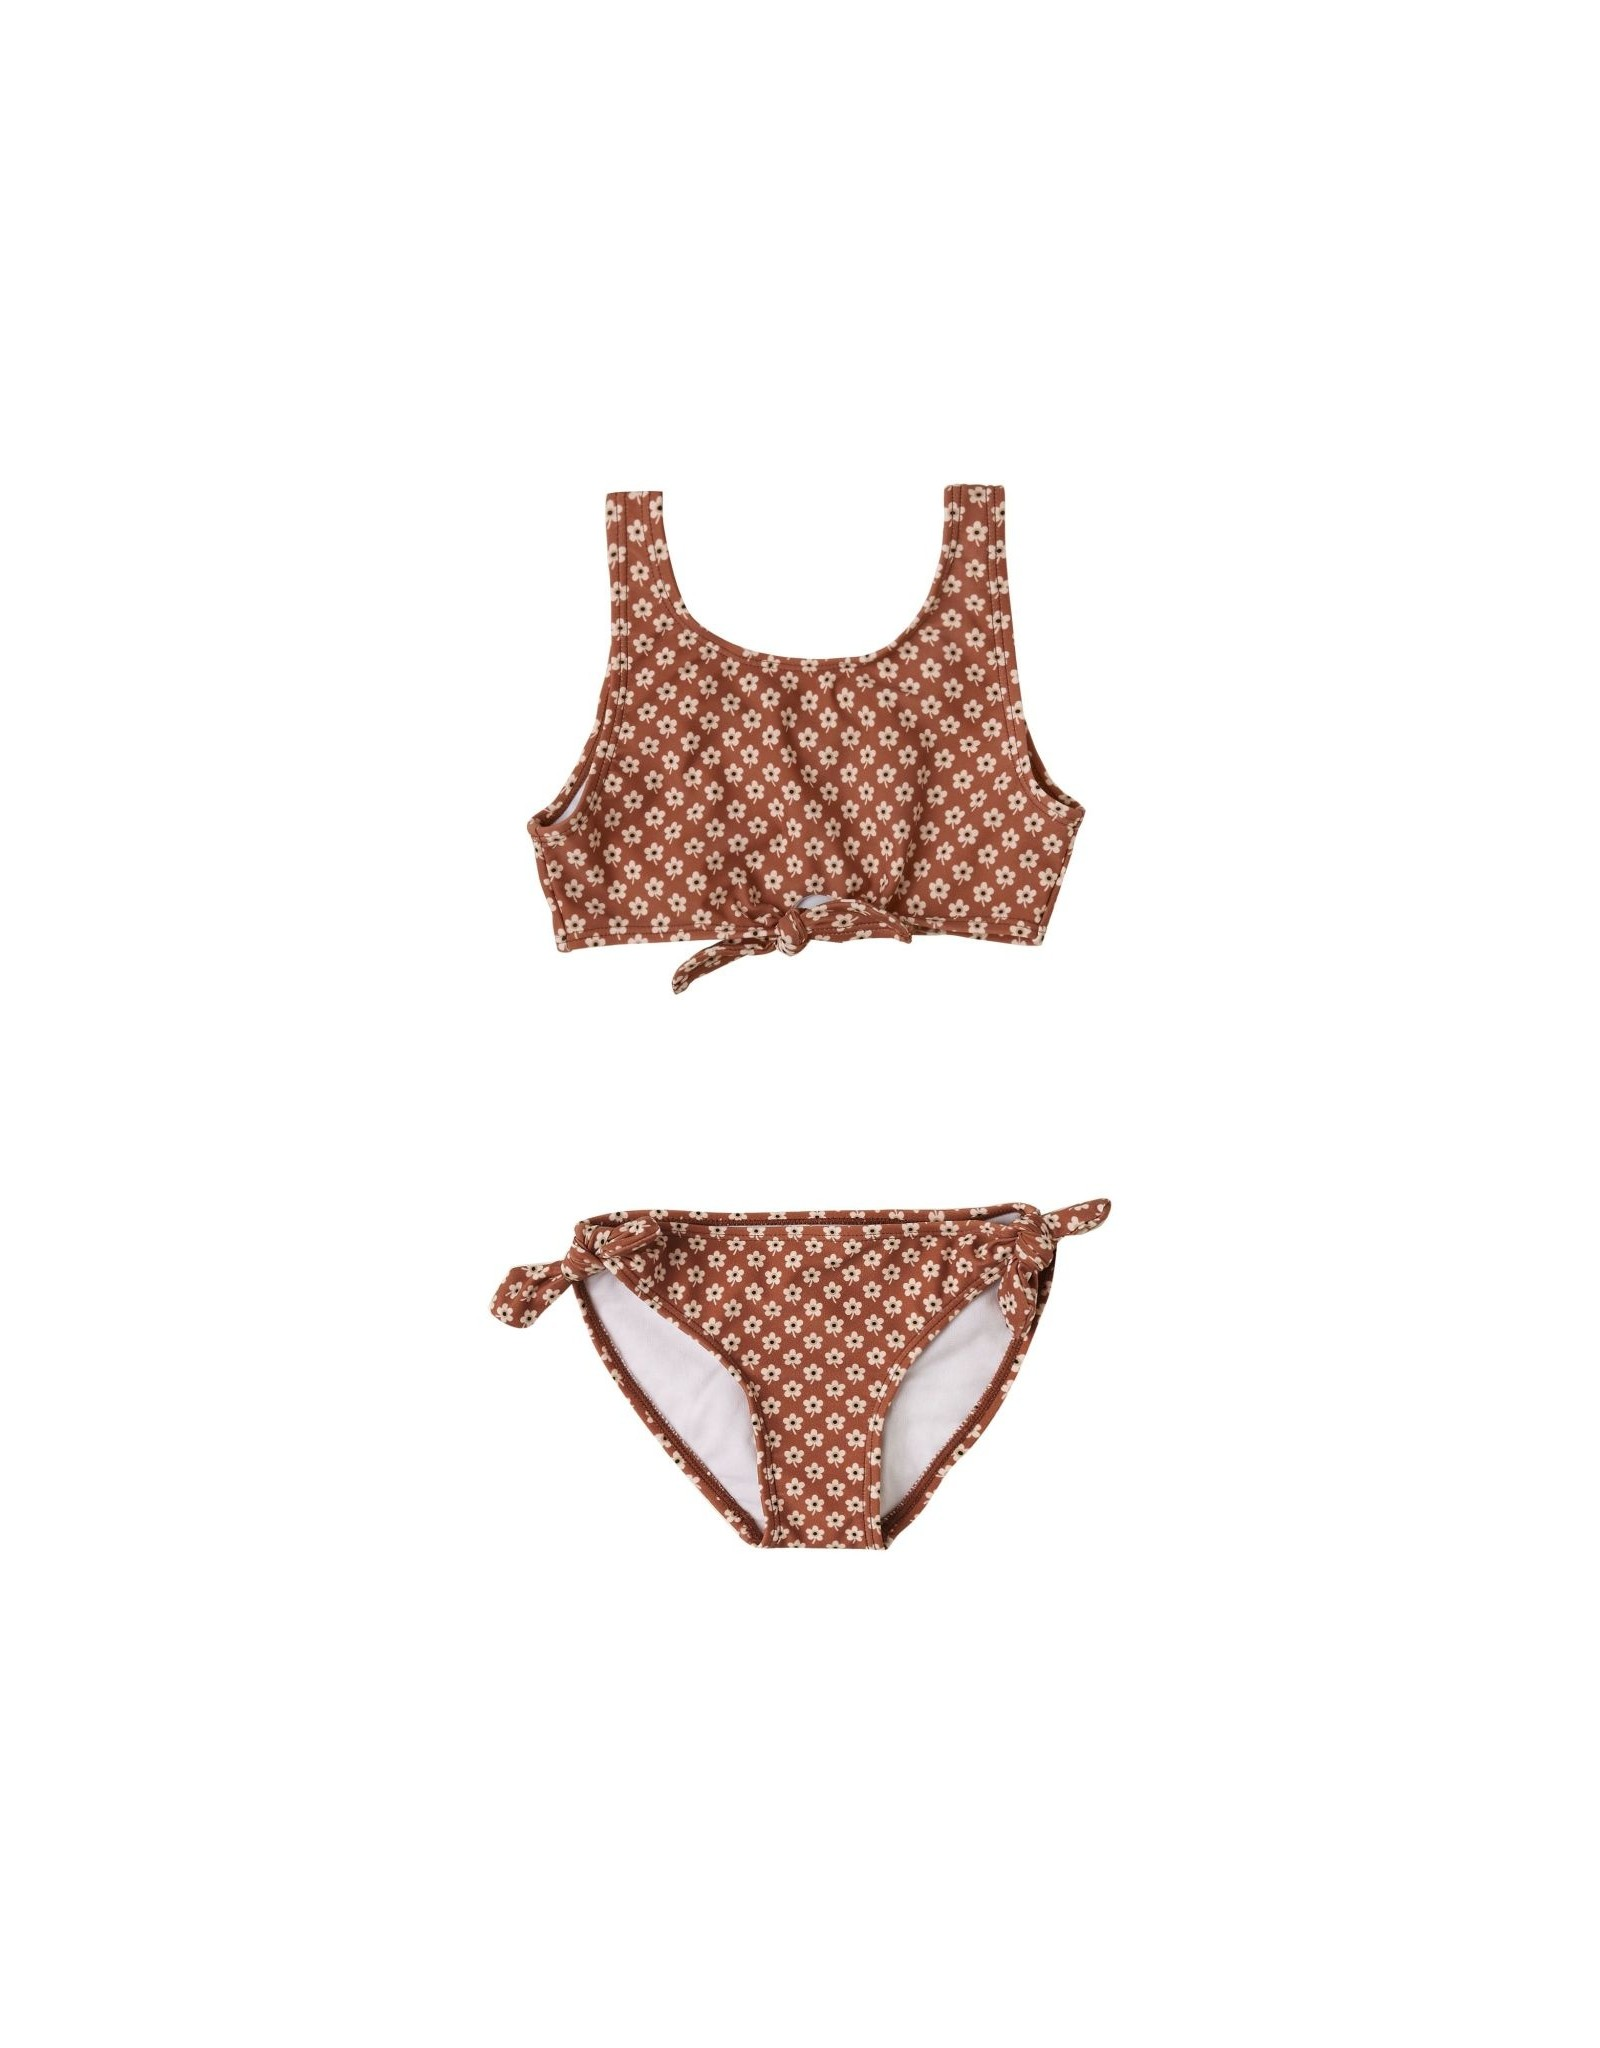 Rylee & Cru Rylee & Cru Knotted Bikini Flower Power